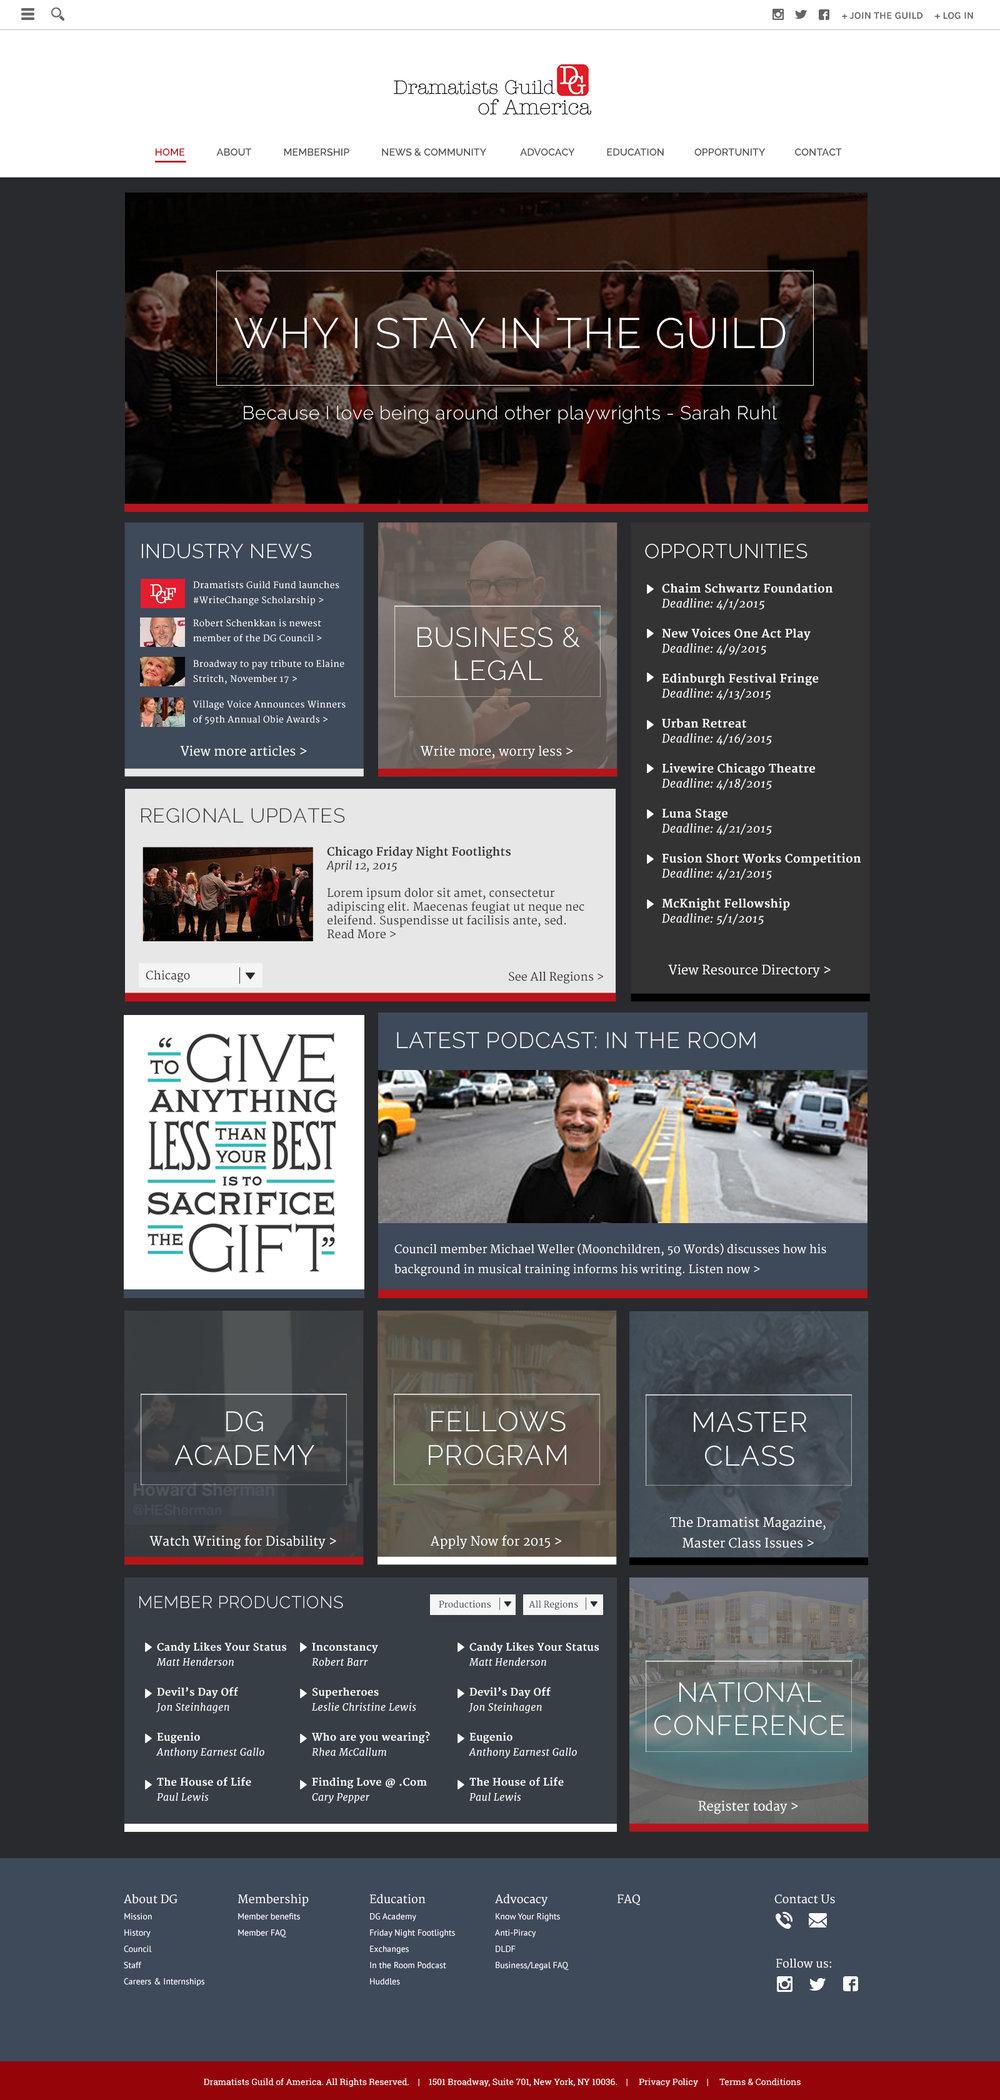 homepage-v3.jpg